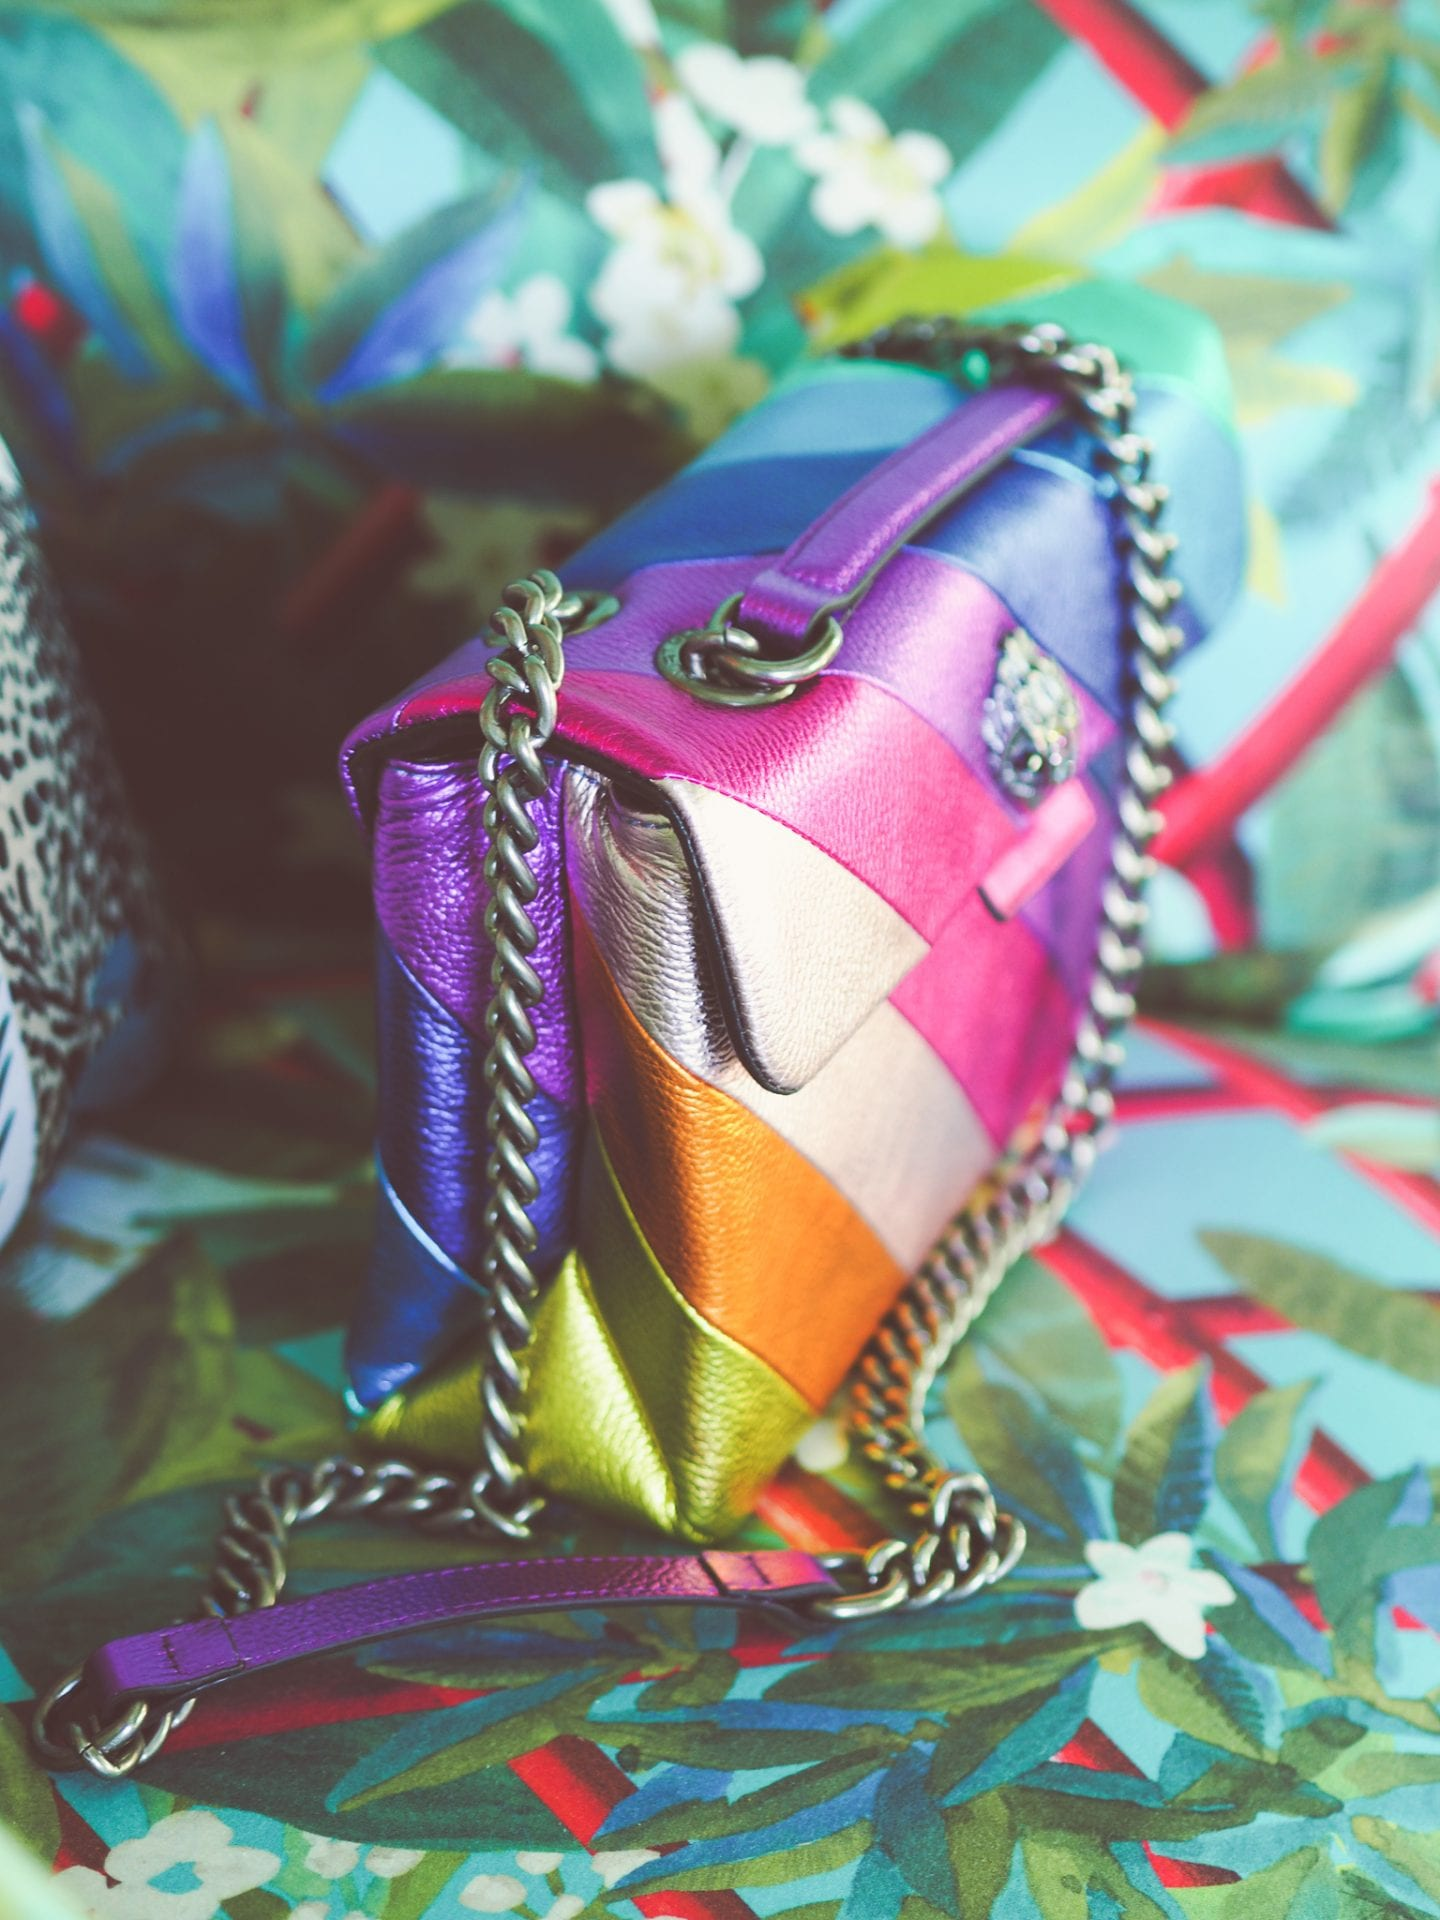 kurt-geiger-rainbow-metallic-bag-side-view-chain-strap